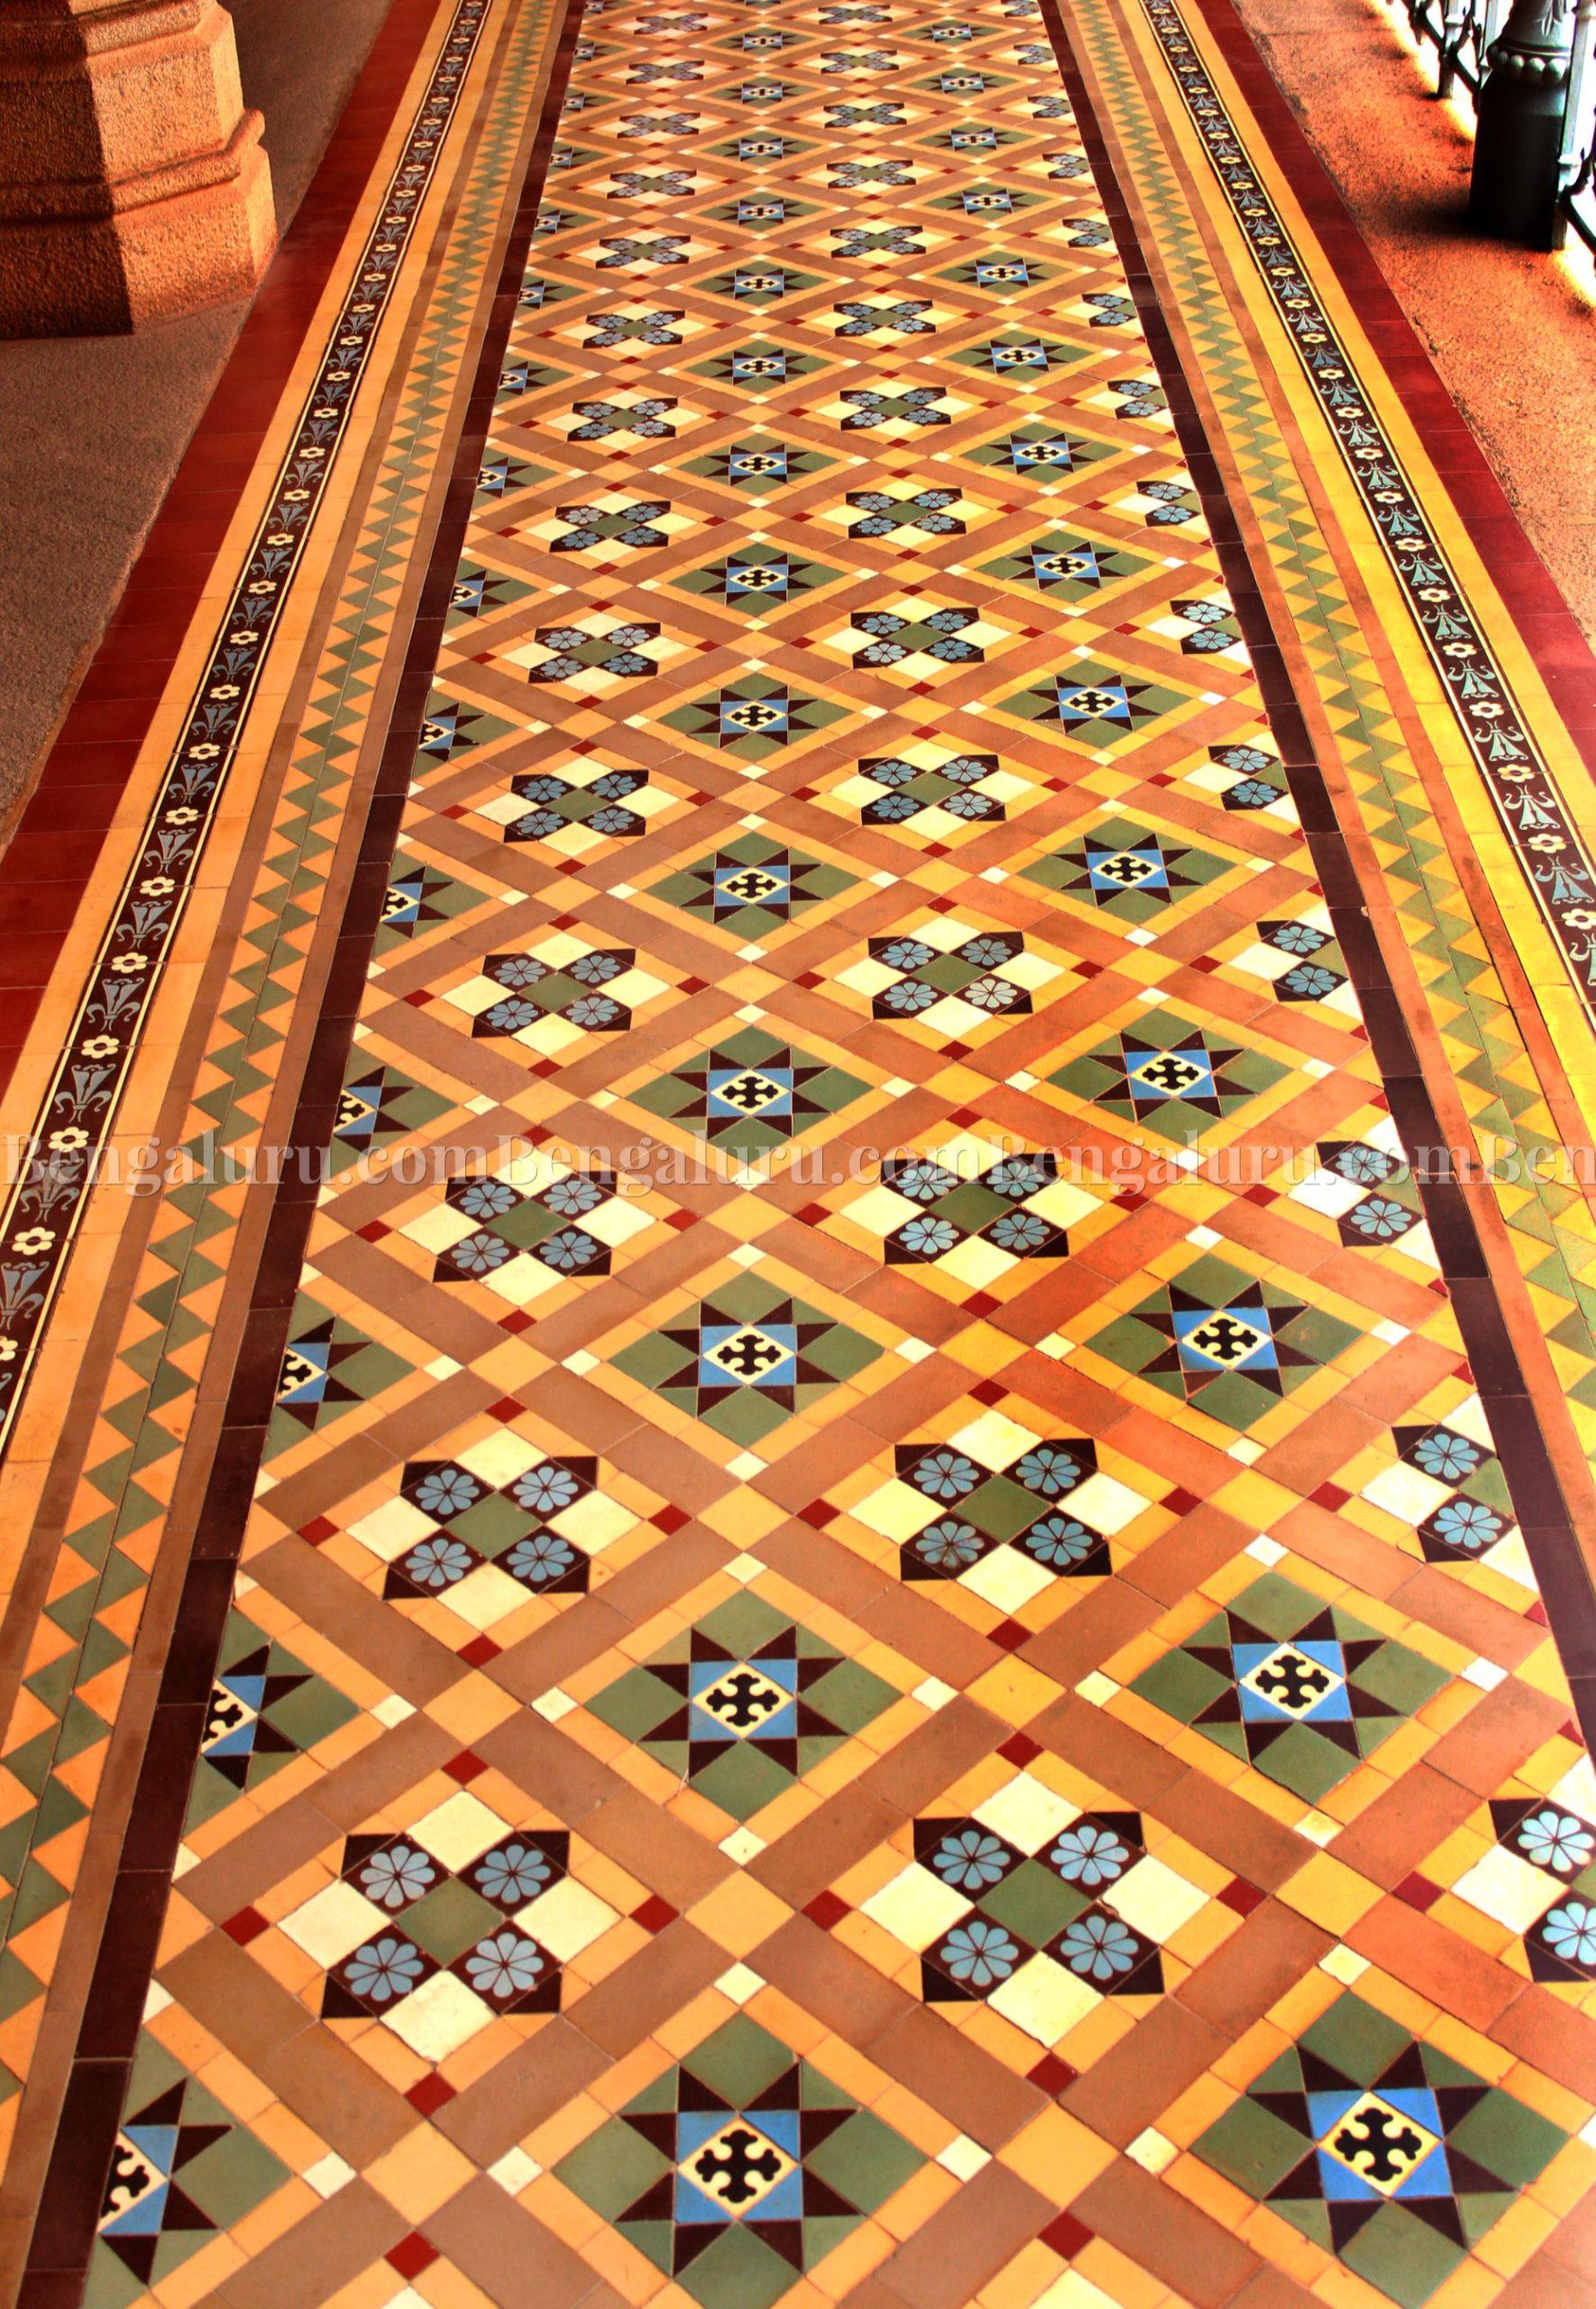 Bengaluru Palace - Carpet Designs